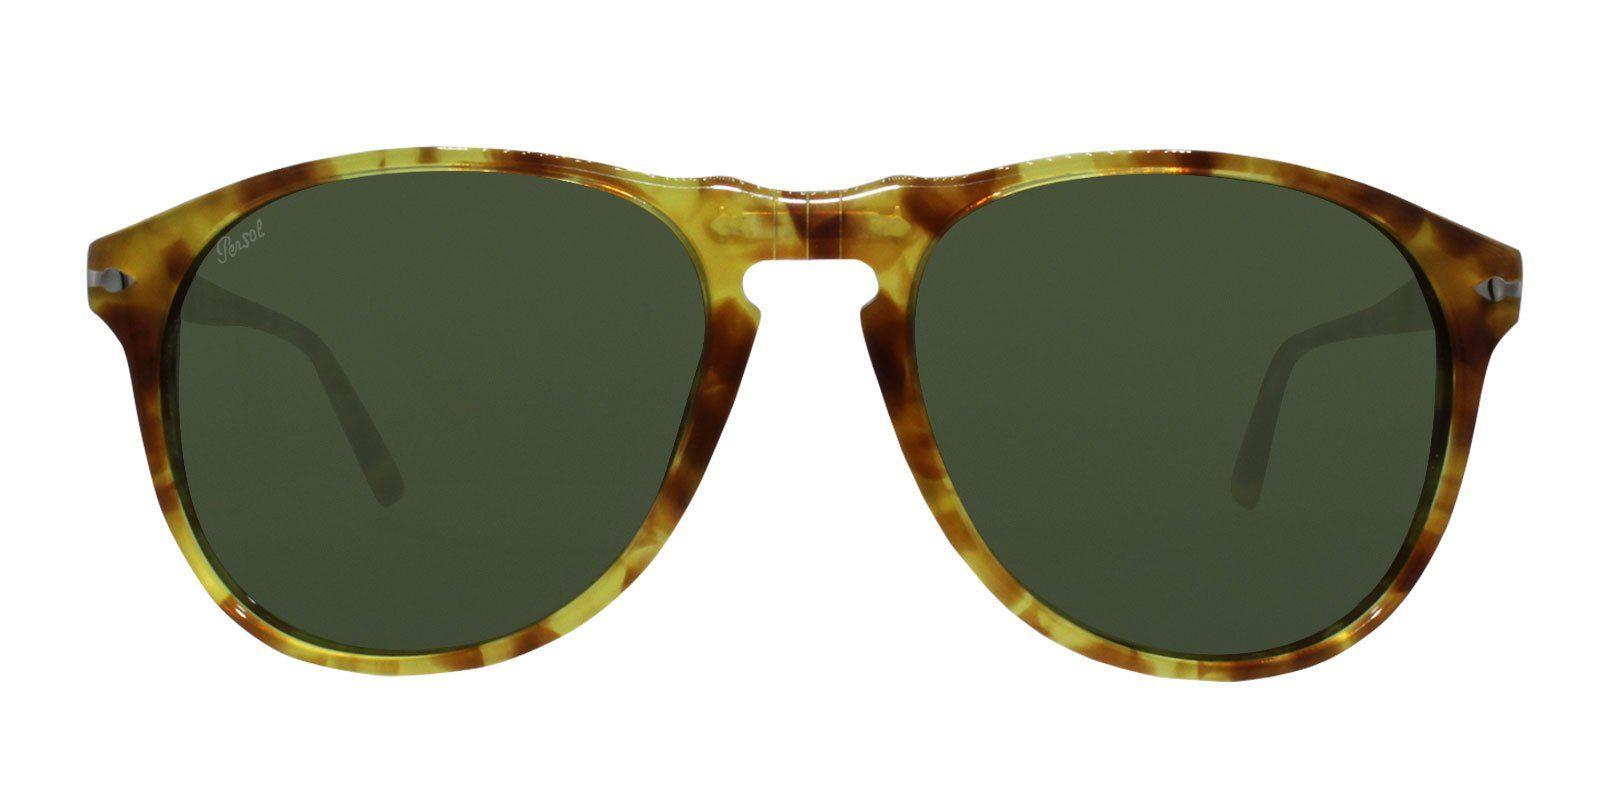 444fbcf4ea Persol PO6649S Tortoise   Green Lens Sunglasses – shadesdaddy